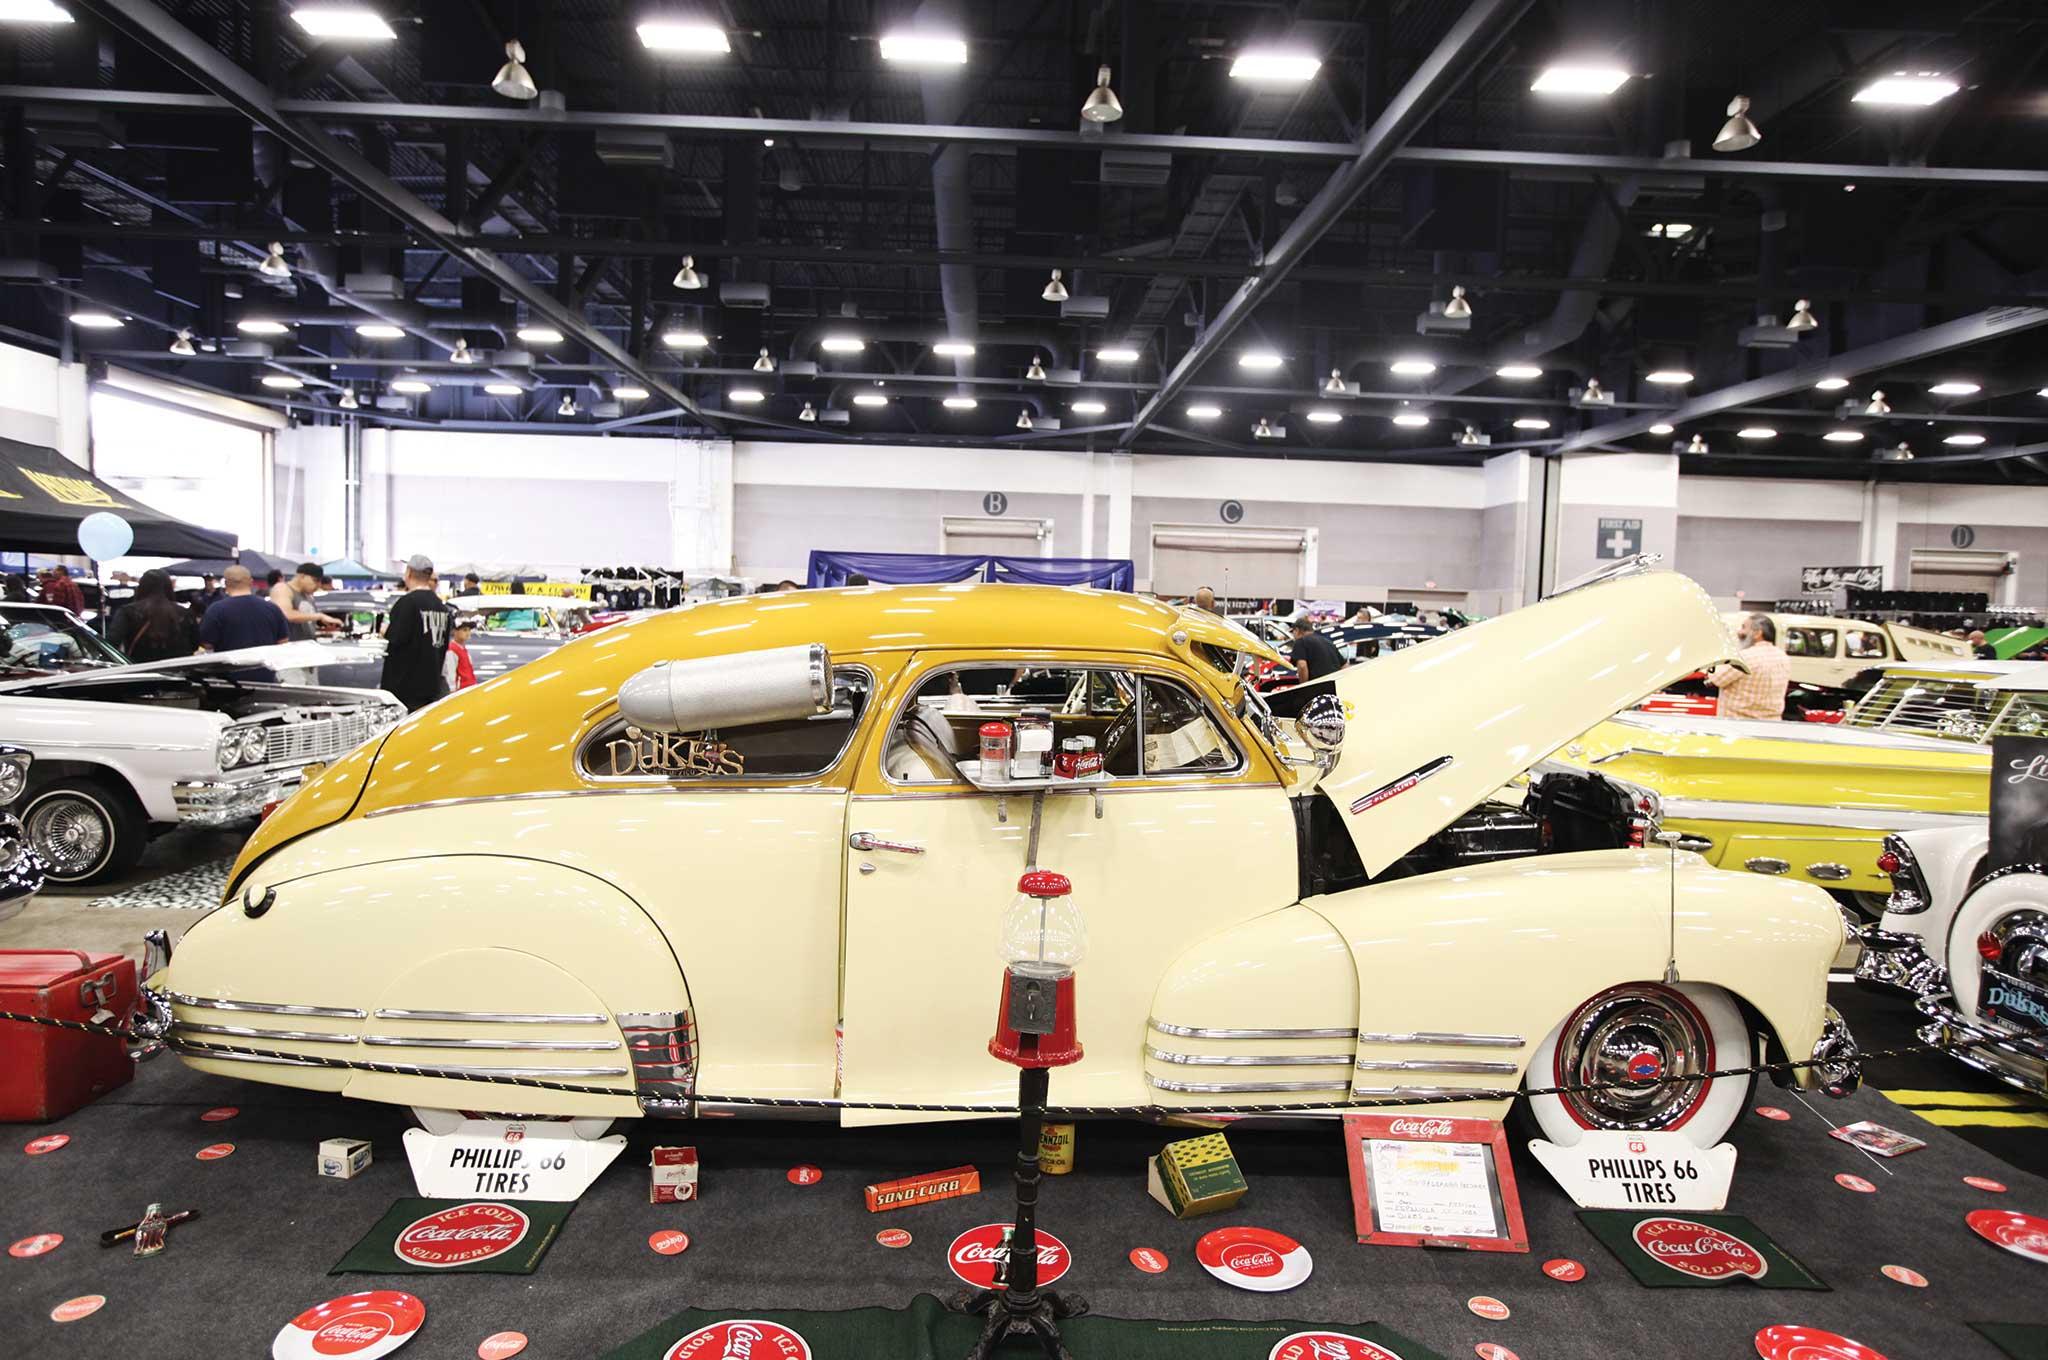 Albuquerque Car Show And Concert Chevy Fleetline Lowrider - Phillips chevy car show